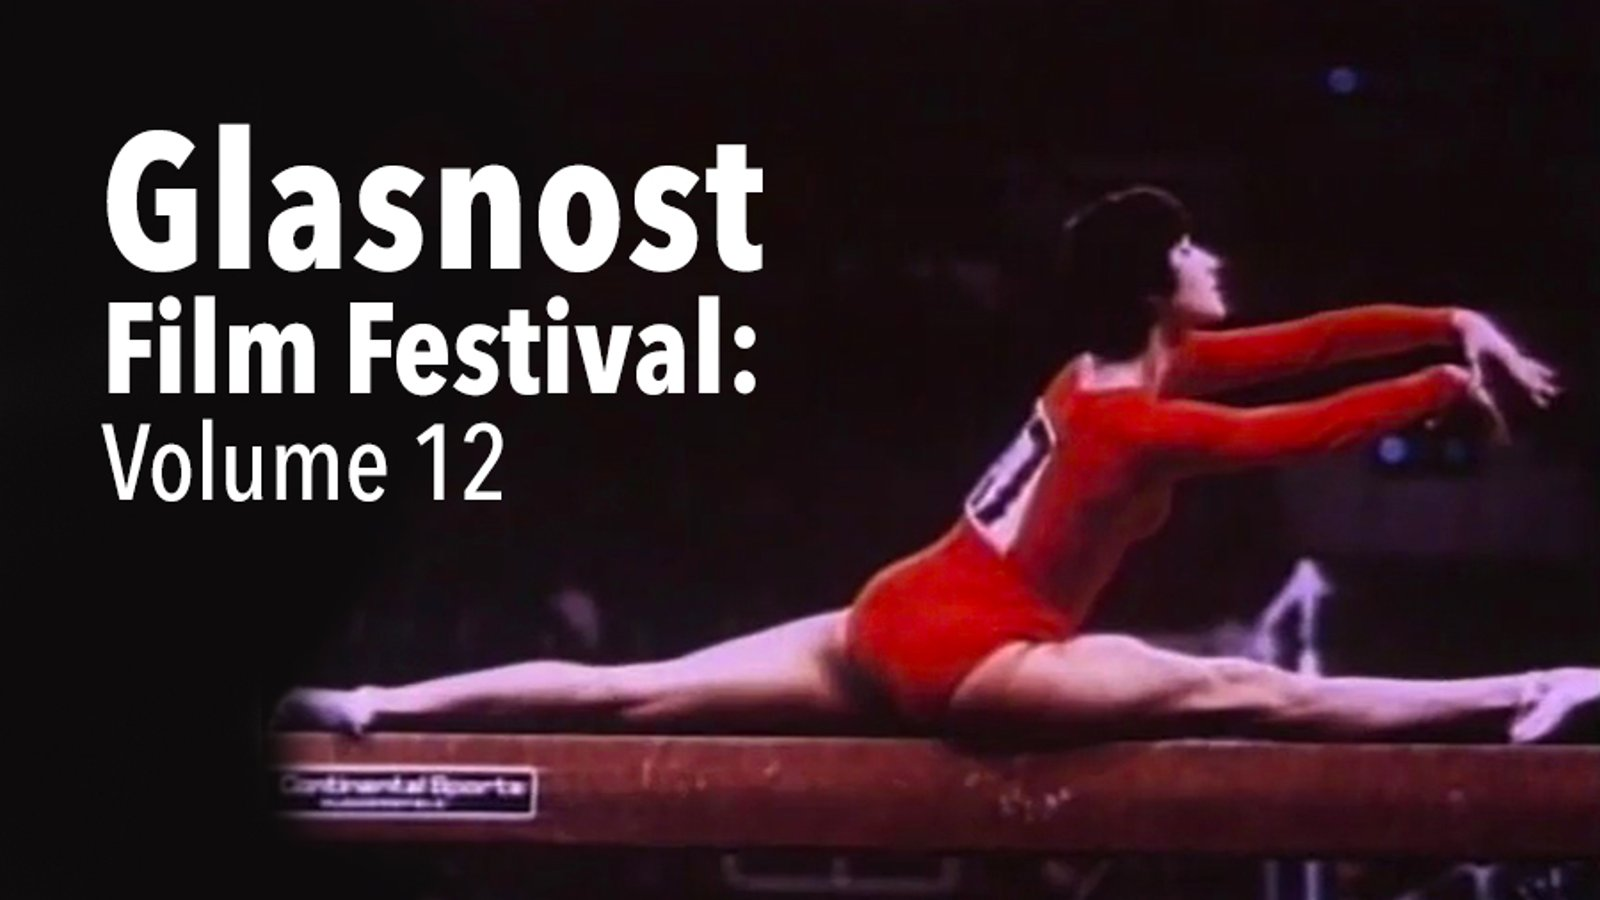 Glasnost Film Festival - Volume 12